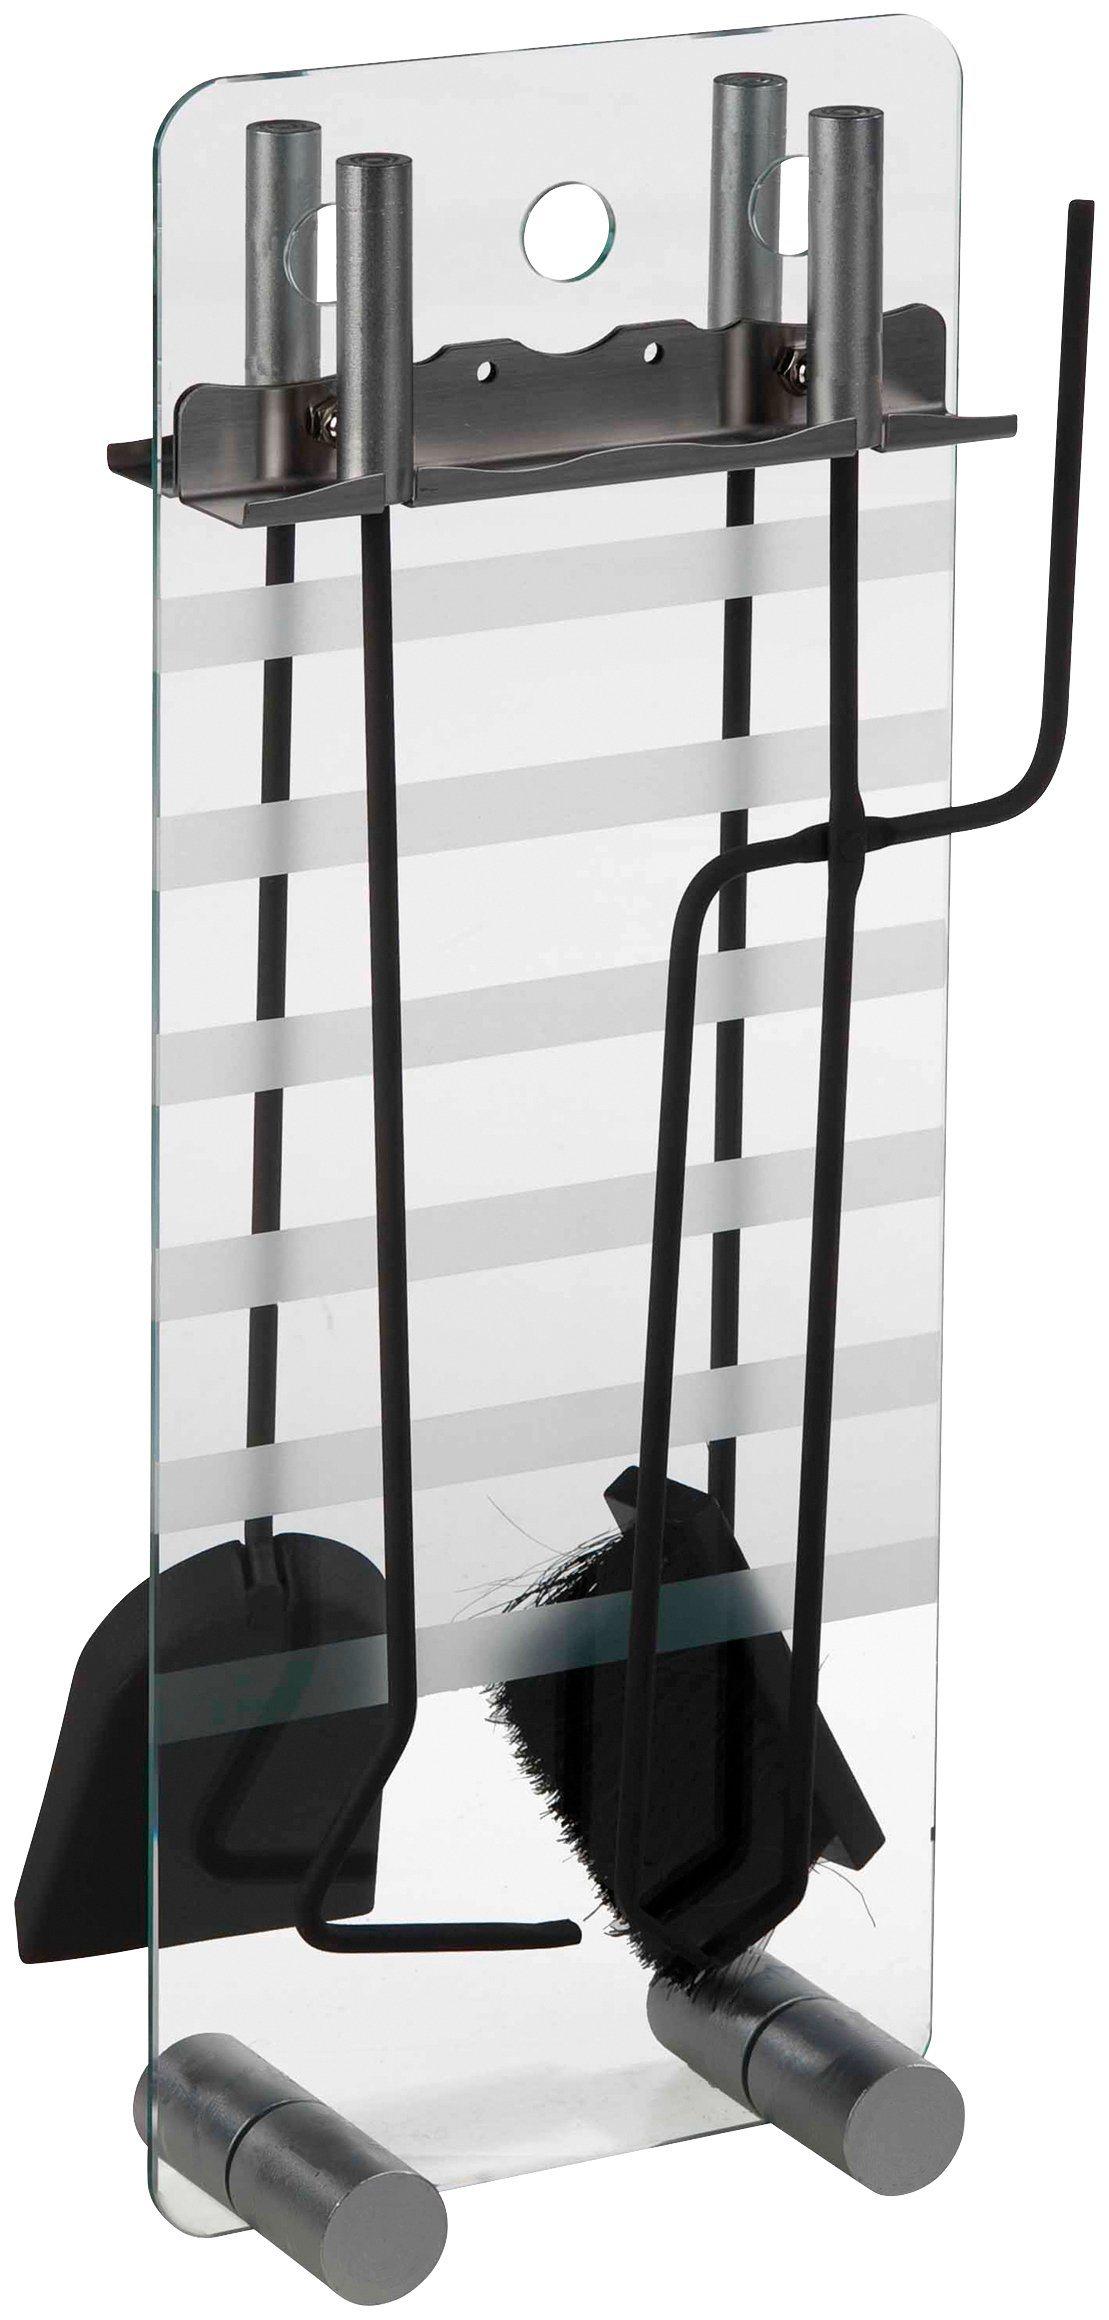 SÜDMETALL Kaminbesteck »Glas«, Set 4-tgl. | Wohnzimmer > Kamine & Öfen > Kaminbestecke | Südmetall